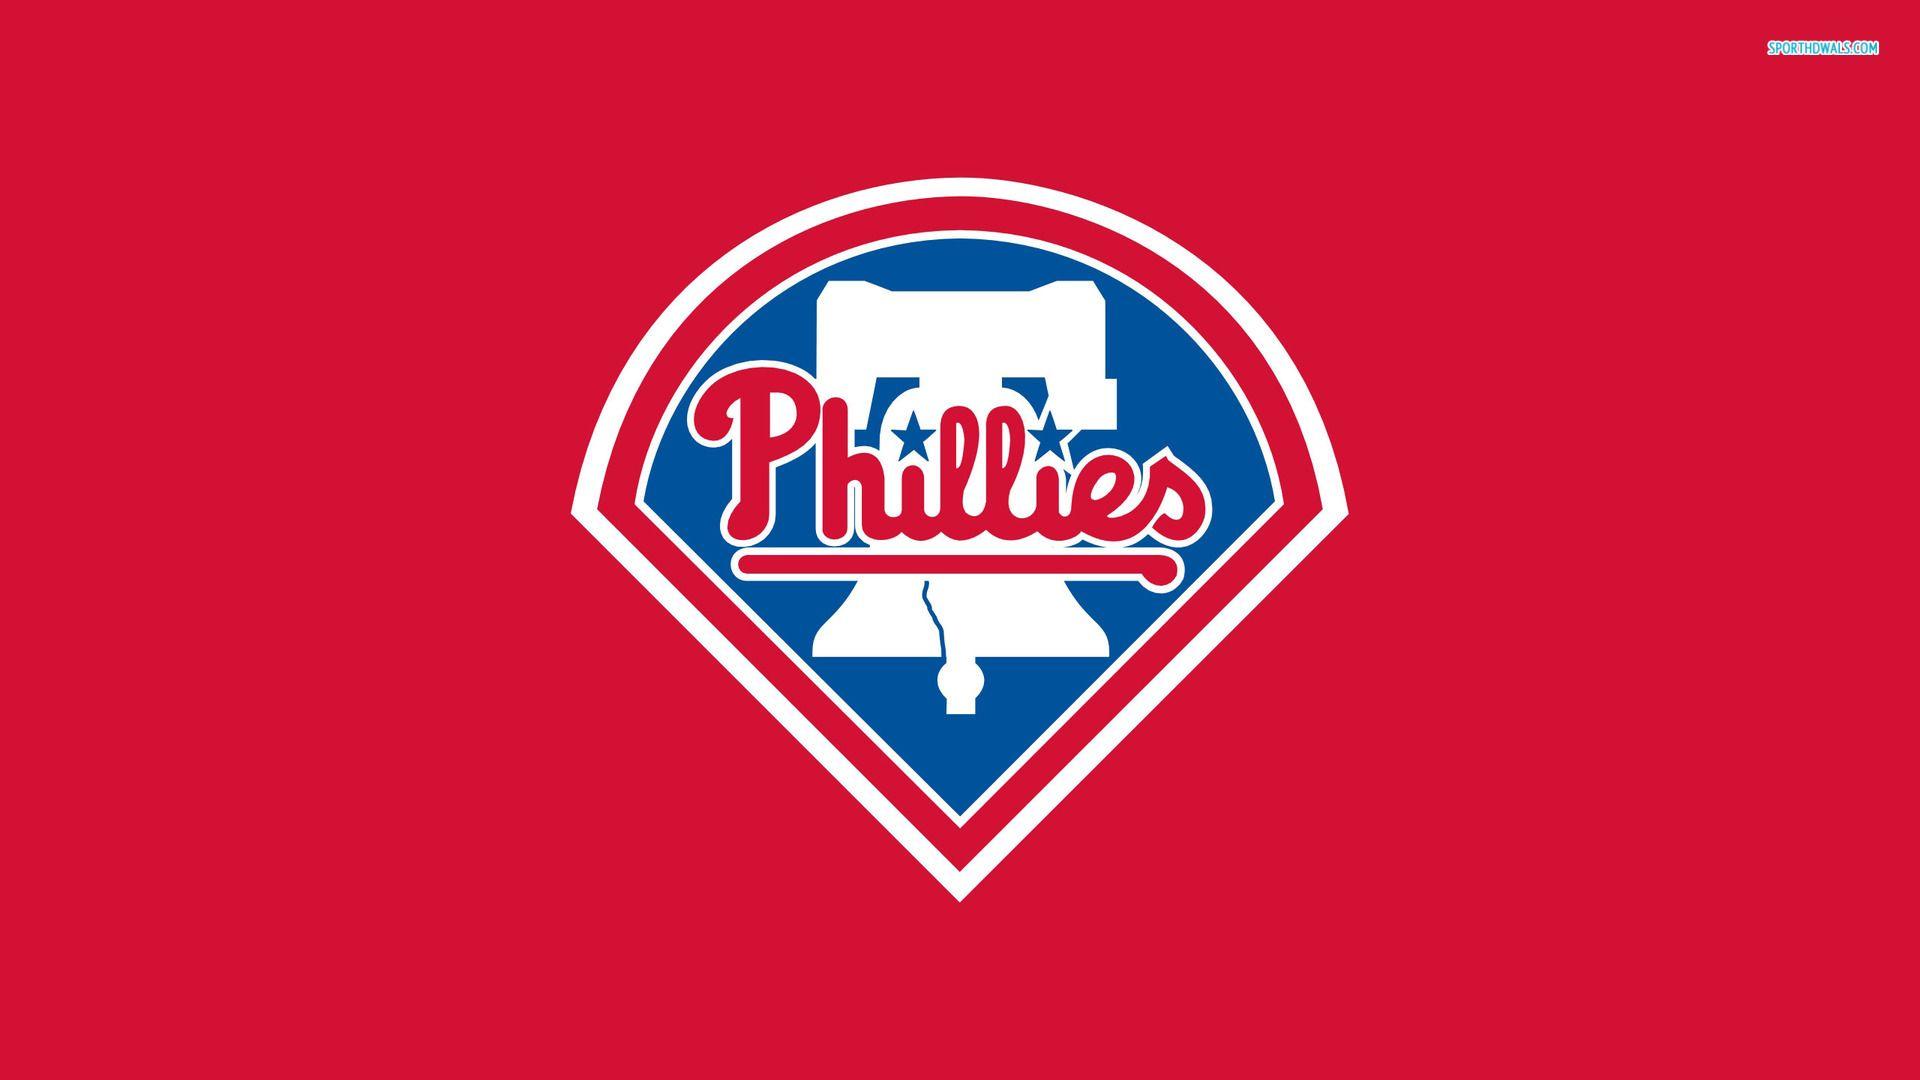 Phillies Logo Desktop Wallpaper